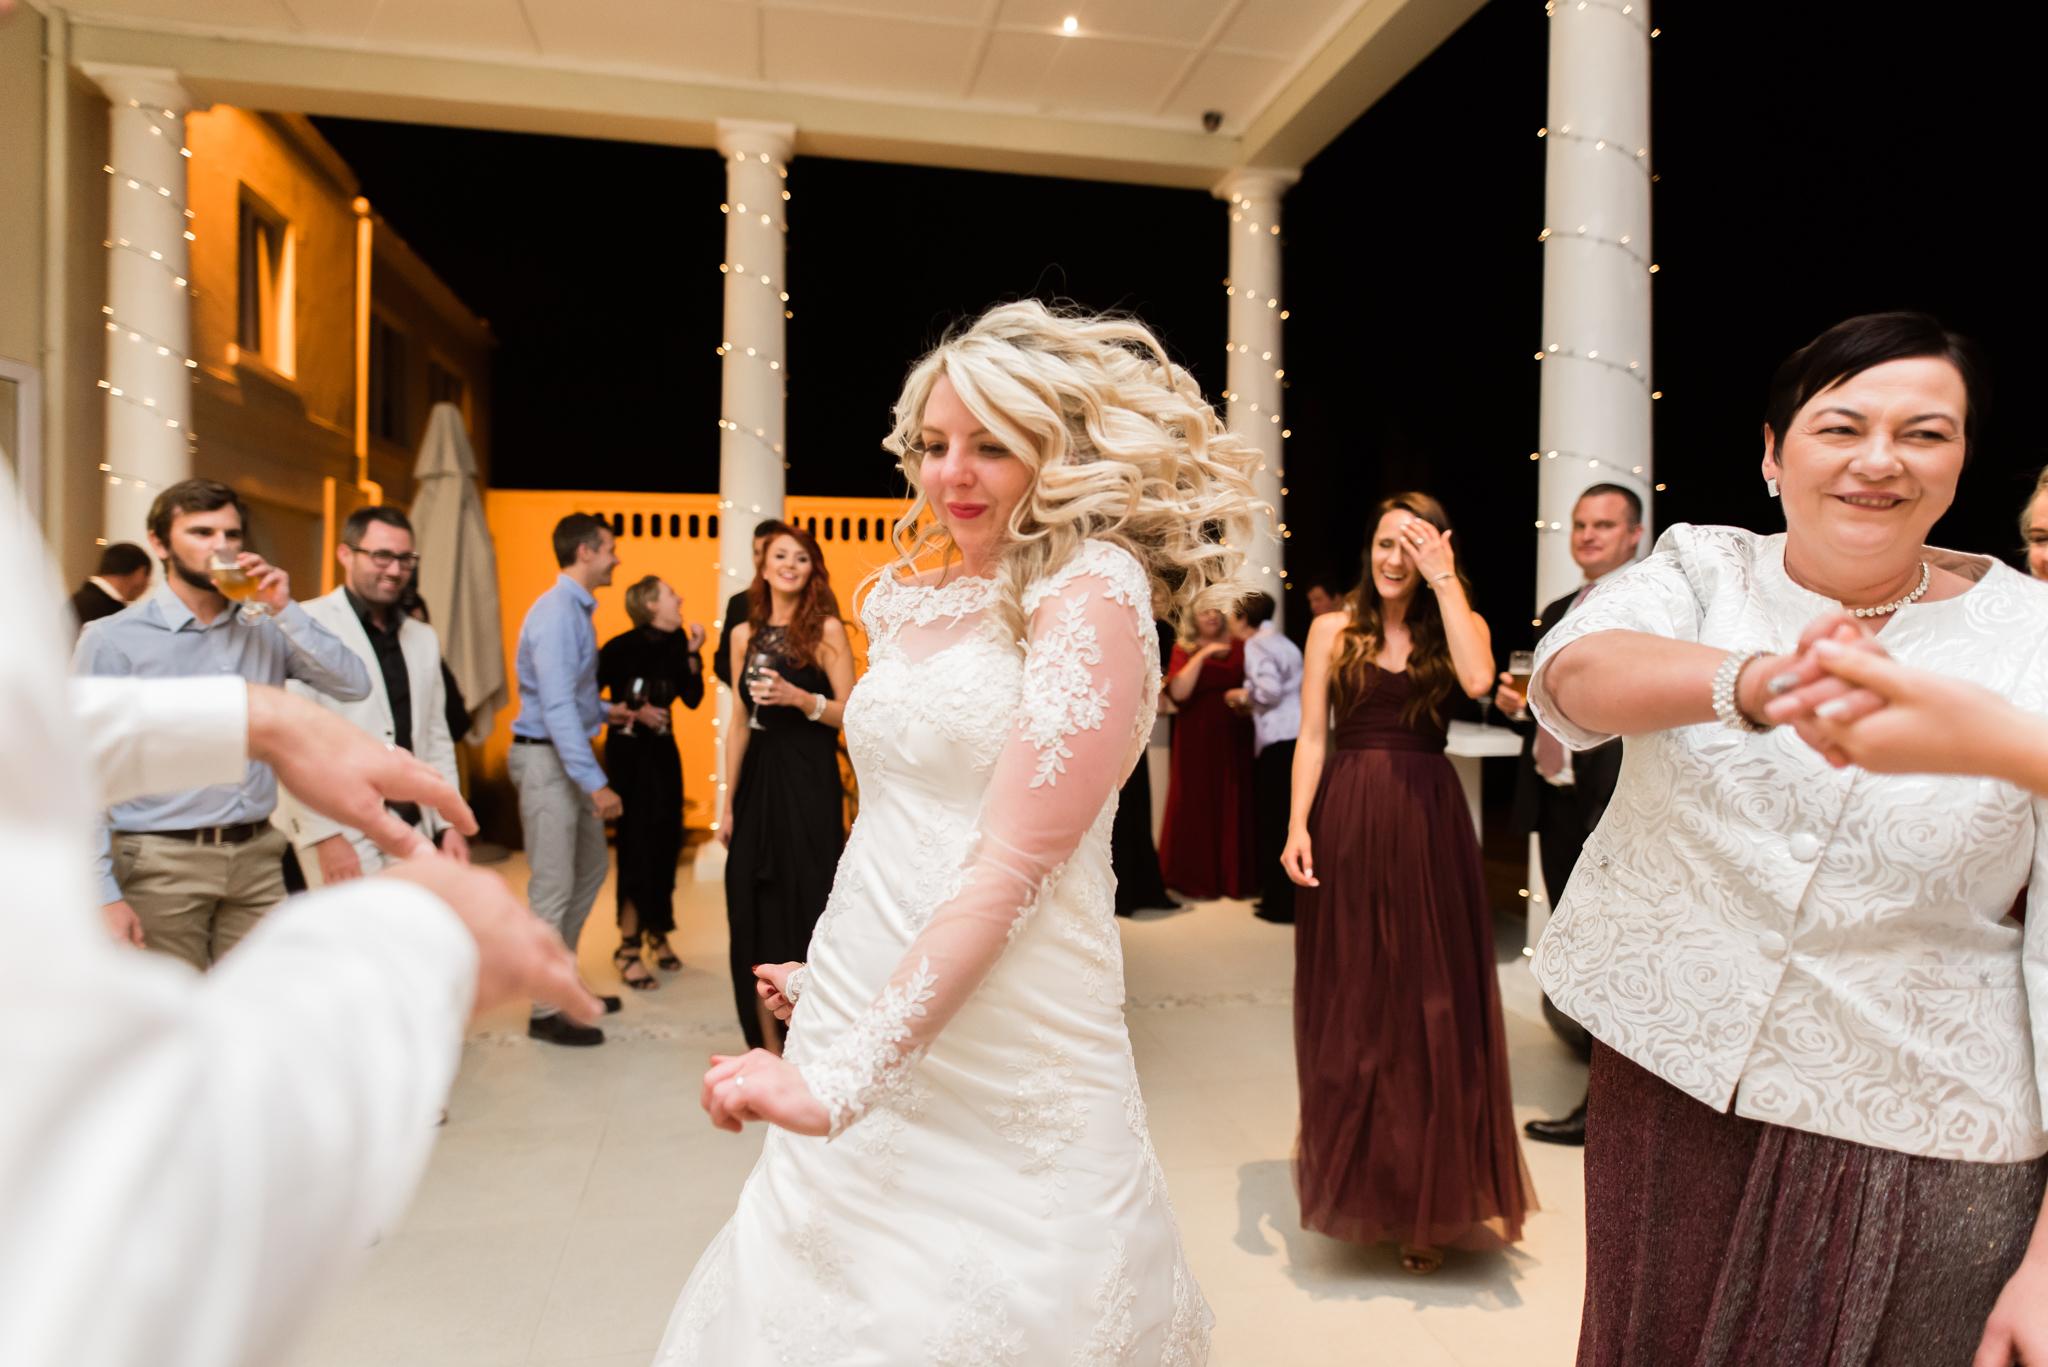 Angelique_Smith_Photography_Pieter&Yvonne_Wedding-550.jpg